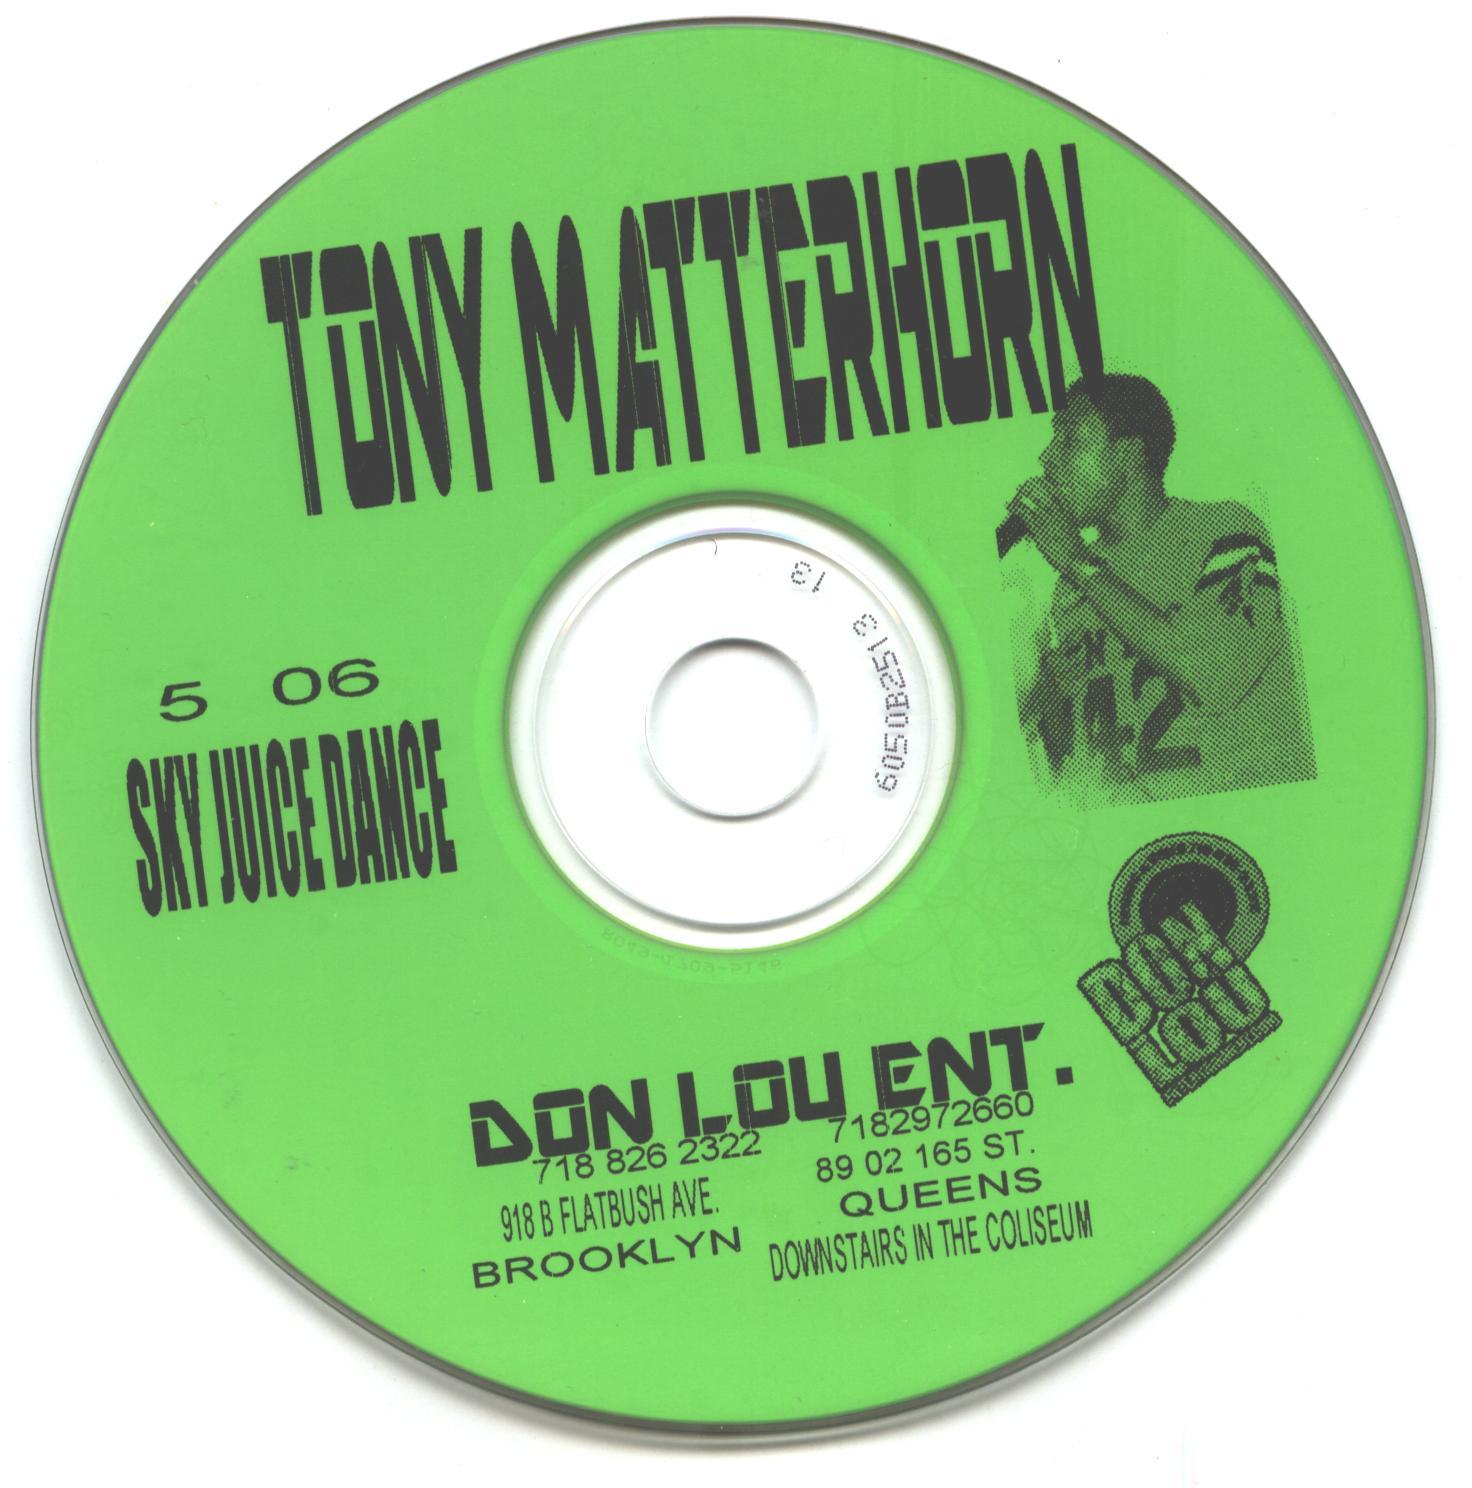 00-va-tony_matterhorn-sky_juice_dance-re